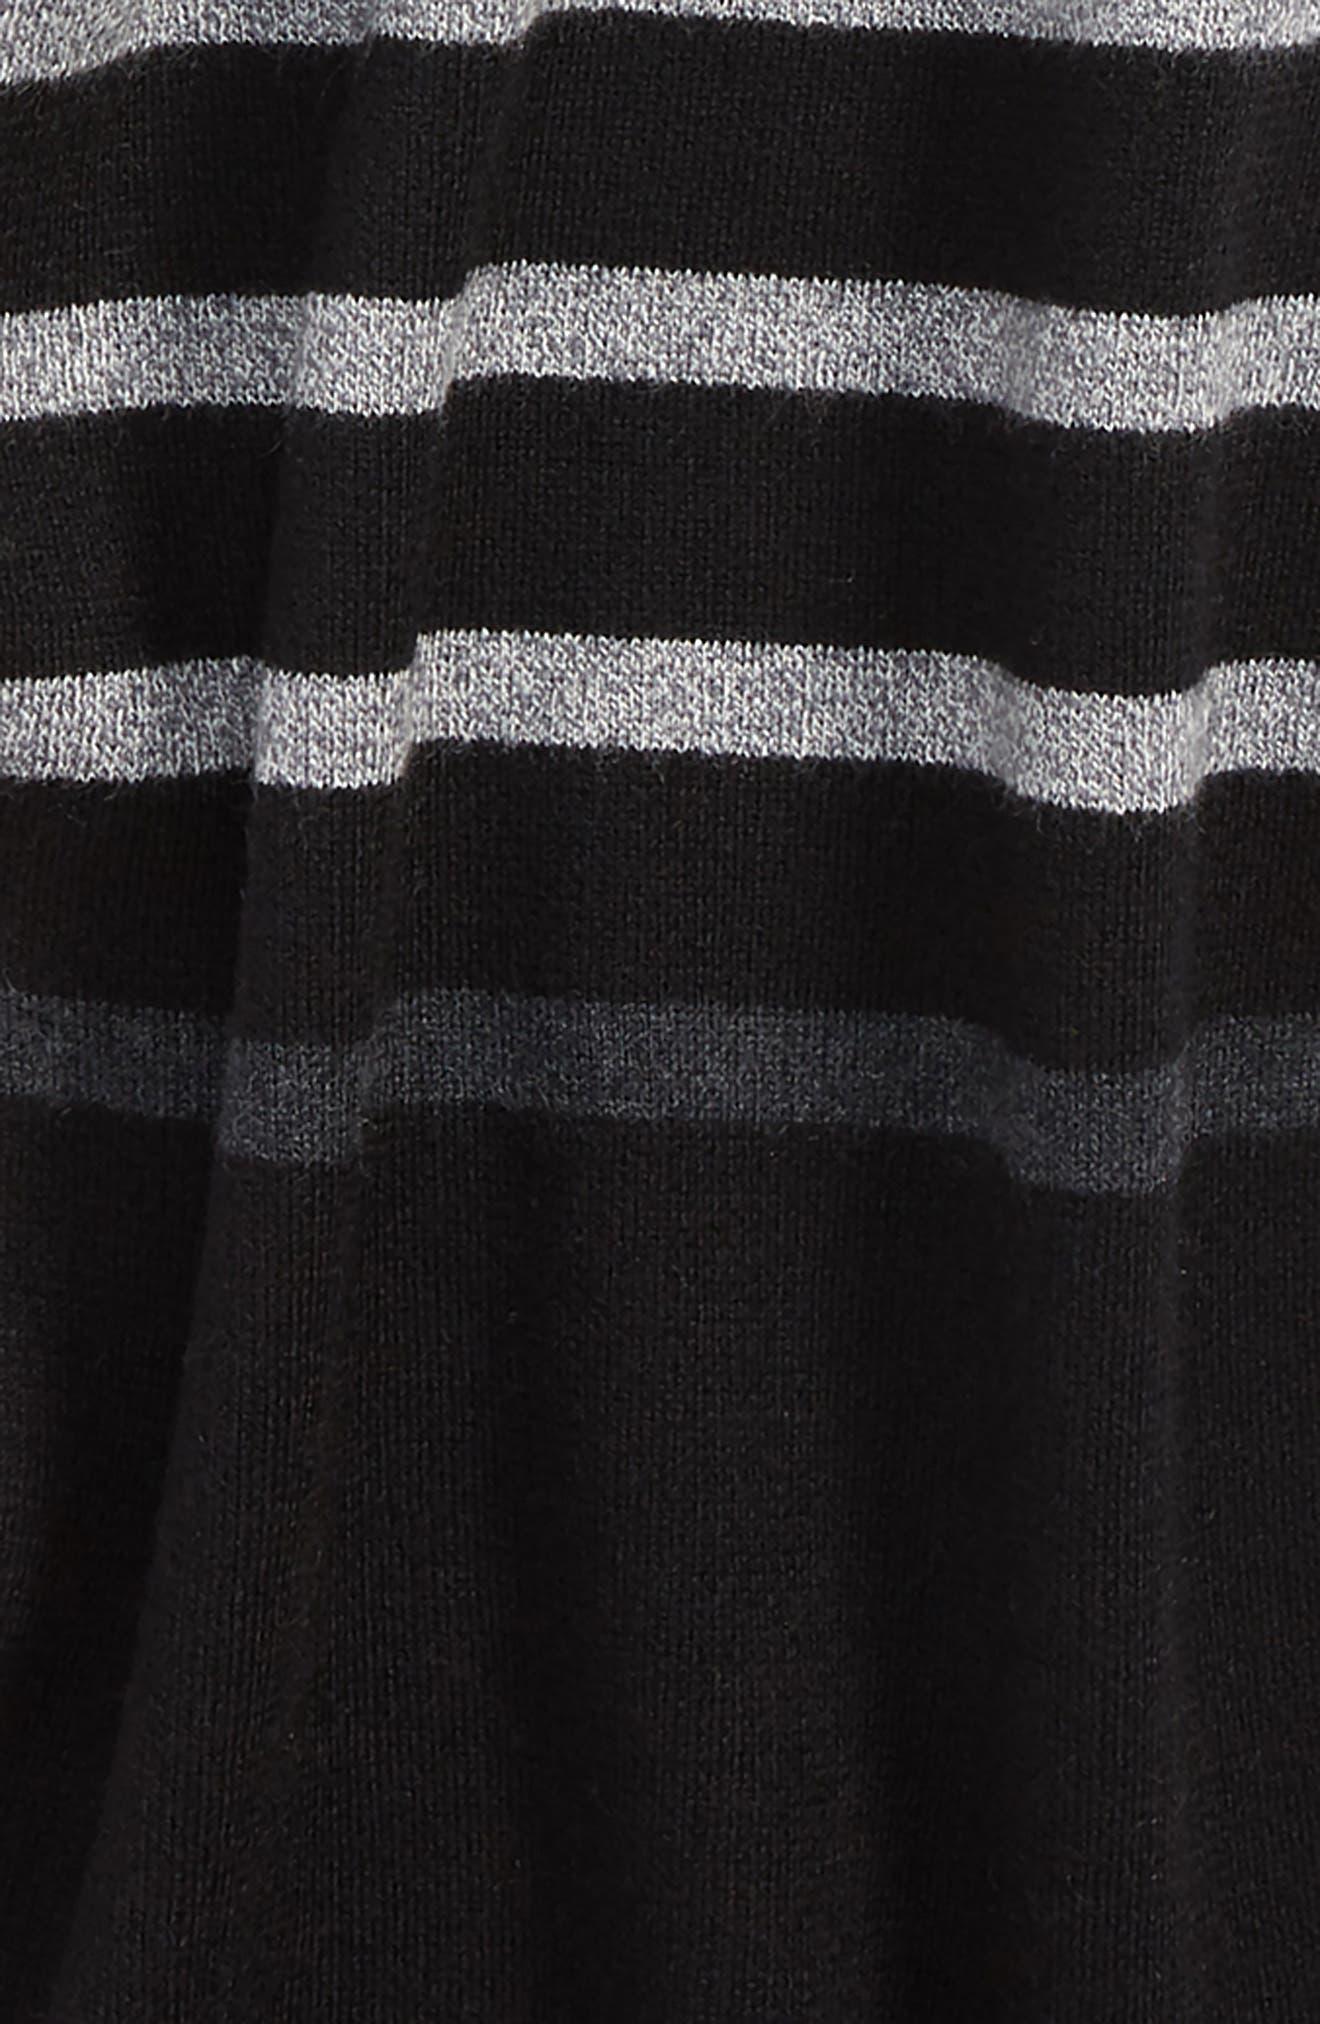 TED BAKER LONDON, Stripe Scarf, Alternate thumbnail 3, color, 001